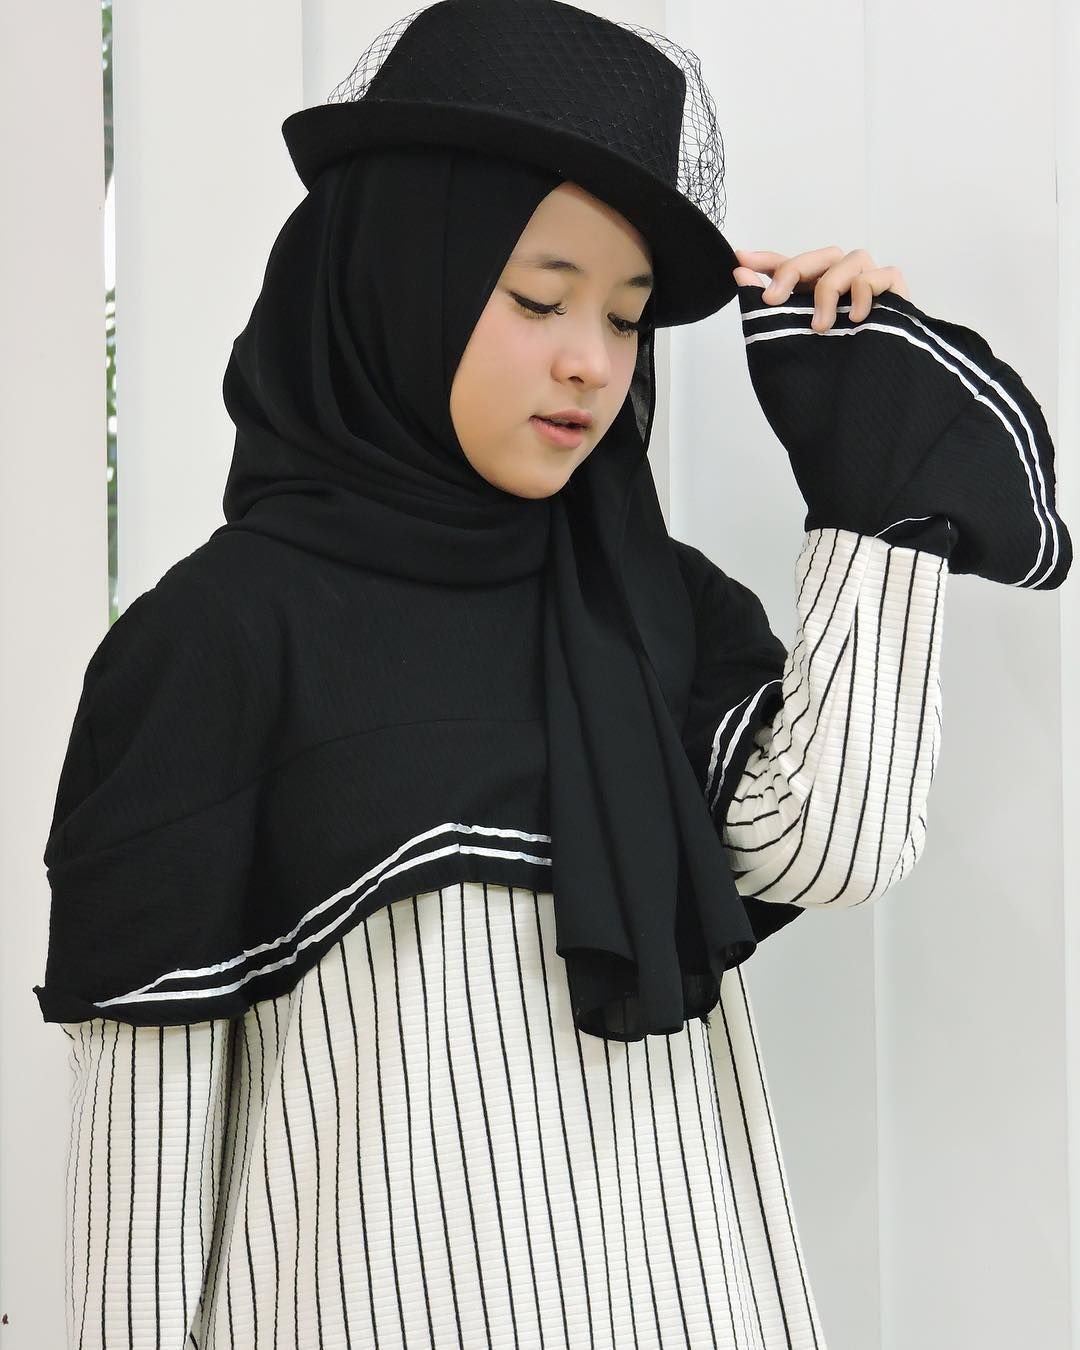 Tutorial Hijab Pashmina Pake Topi Baju Muslim Gaya Hijab Model Pakaian